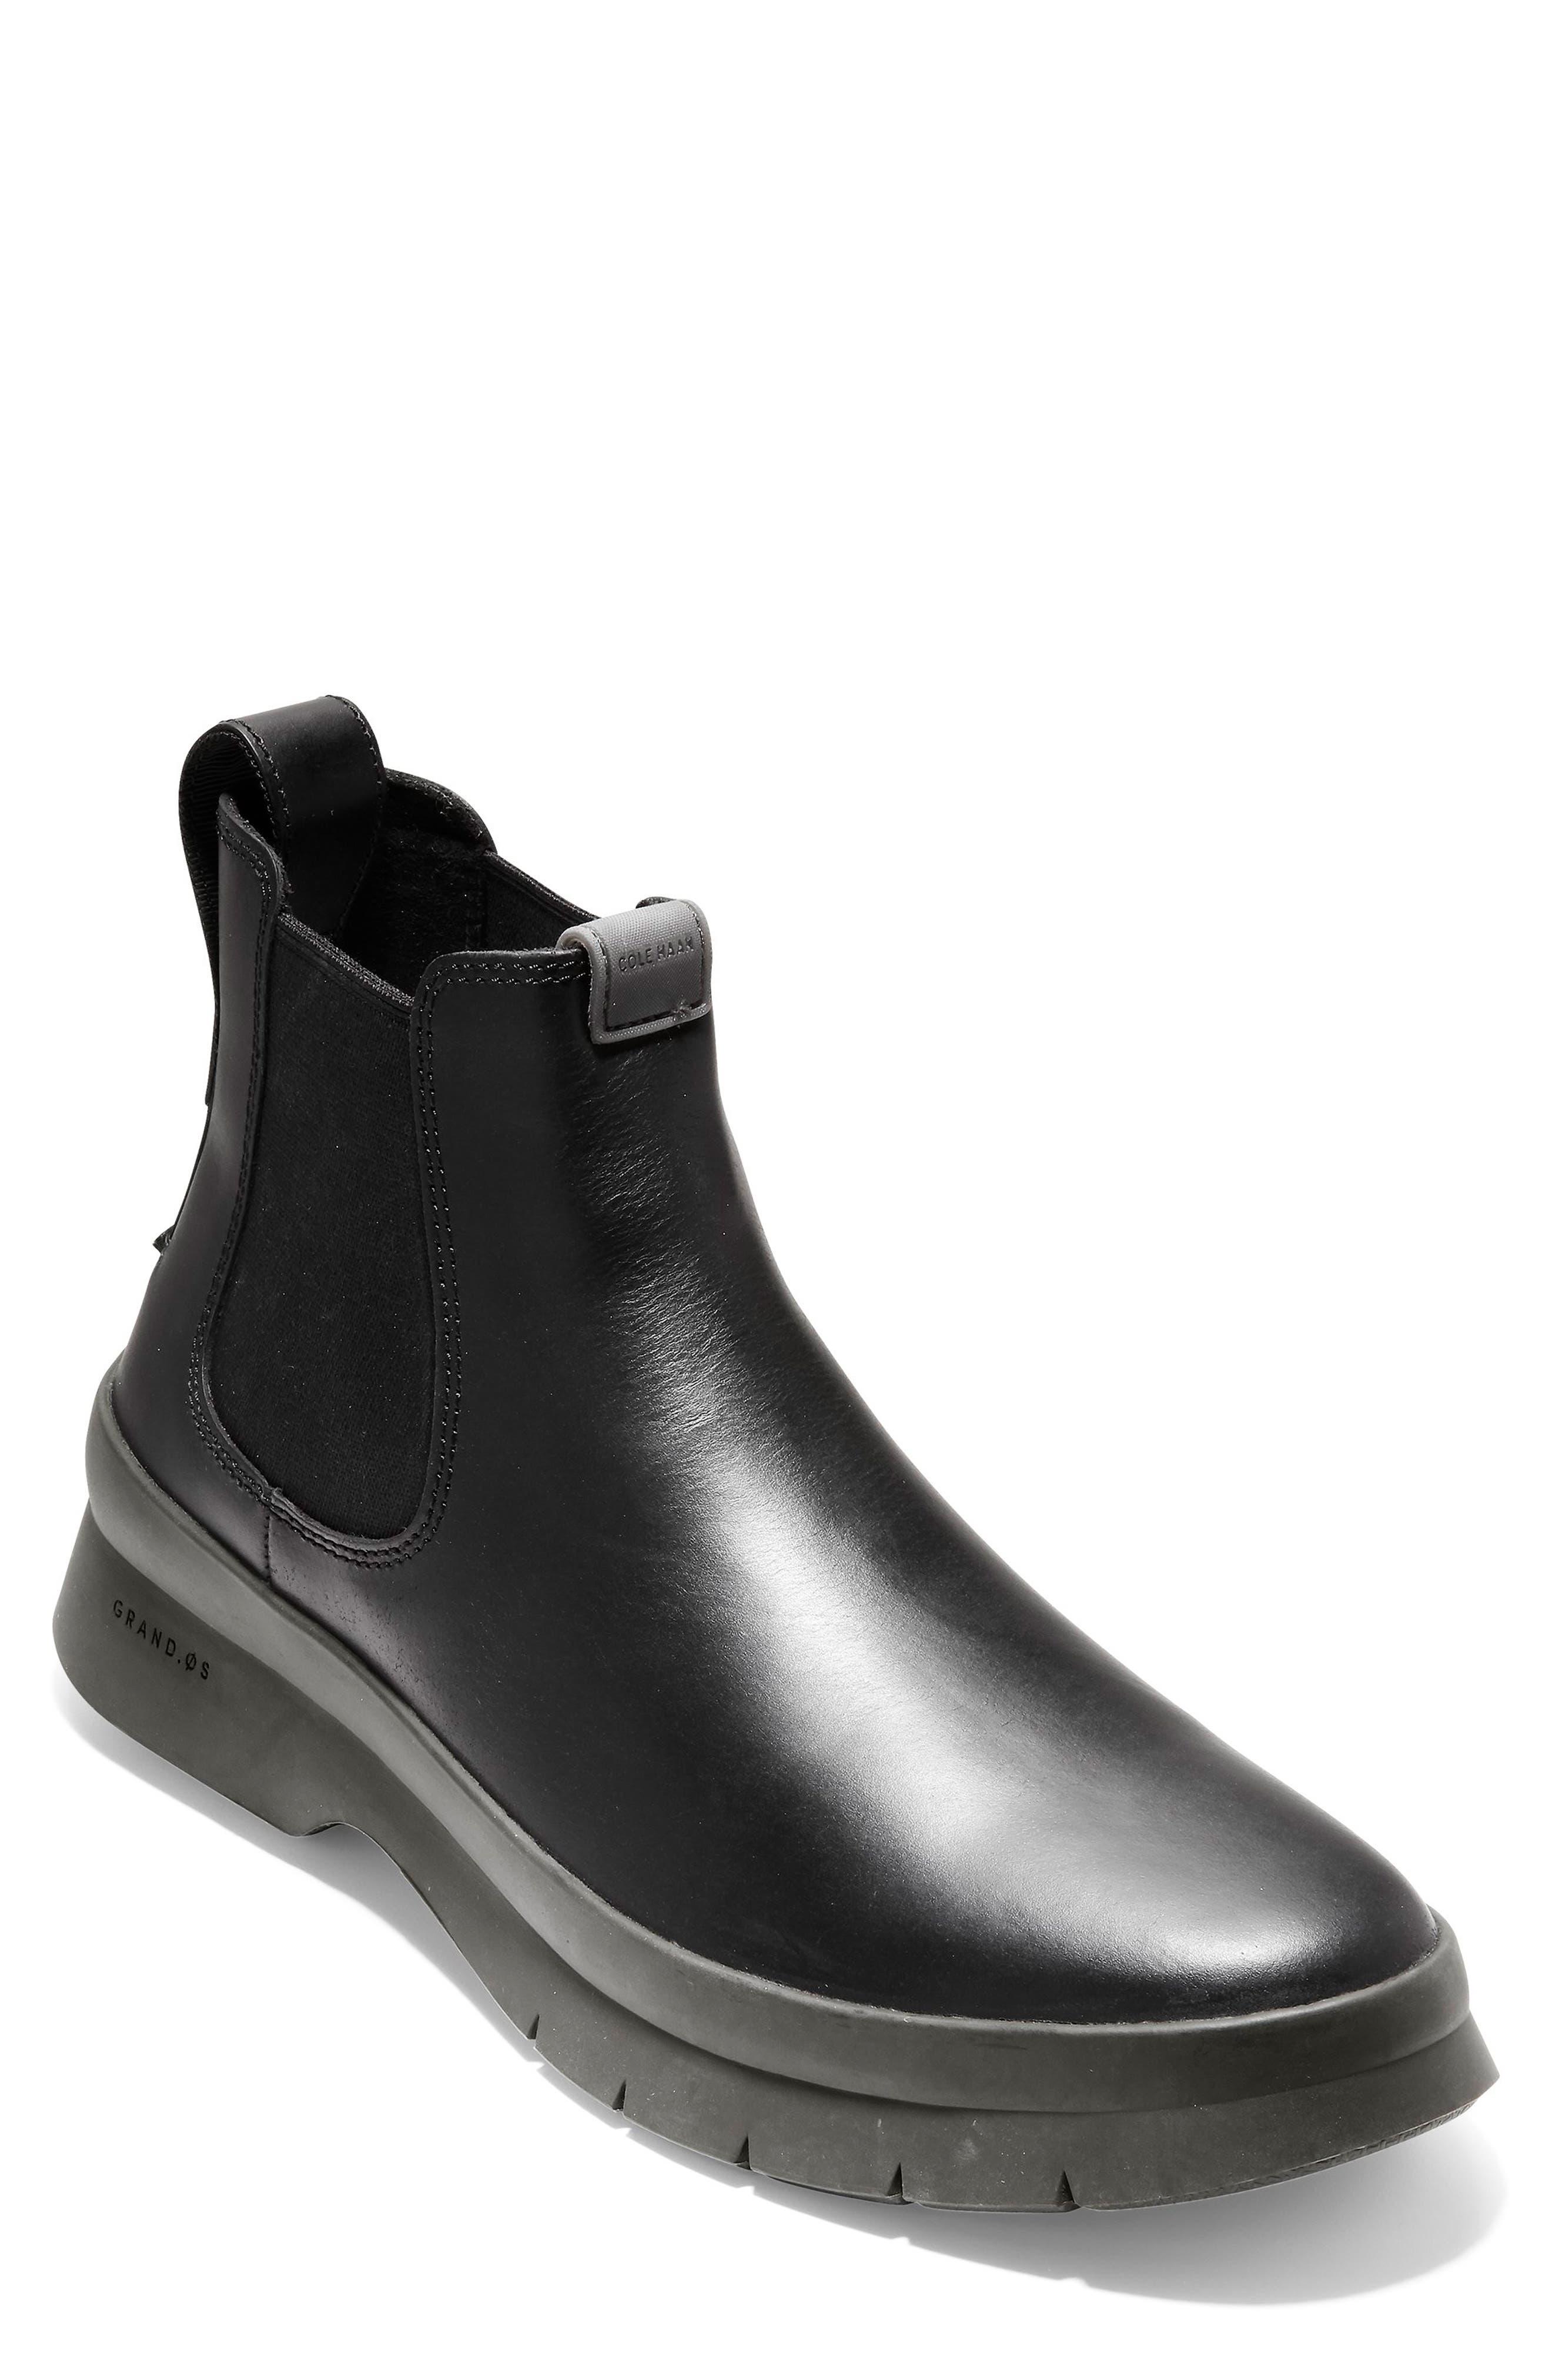 Pinch Utility Waterproof Chelsea Boot,                         Main,                         color, BLACK/ HAZEL LEATHER